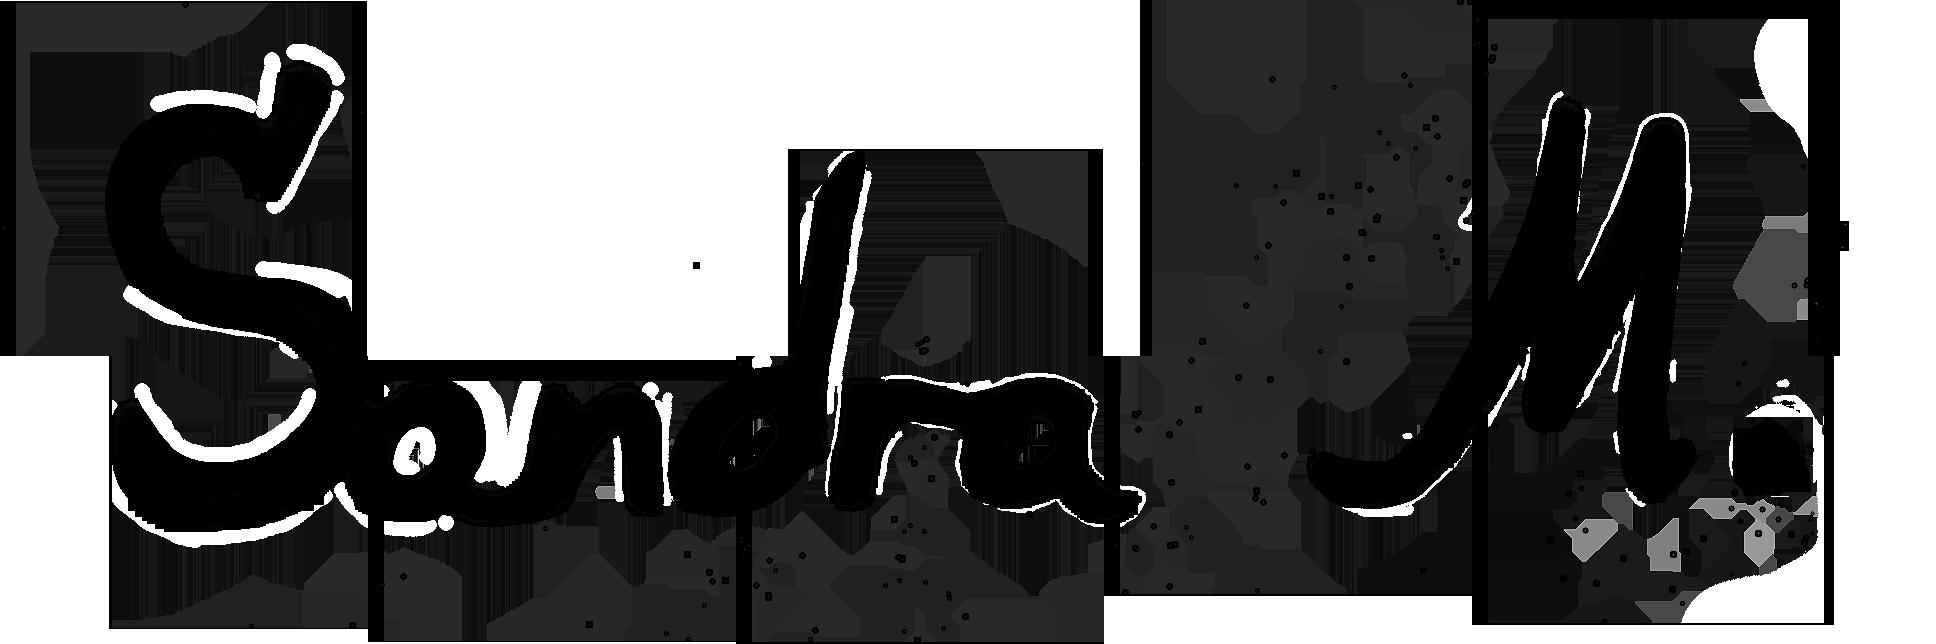 Sandra M.'s Signature